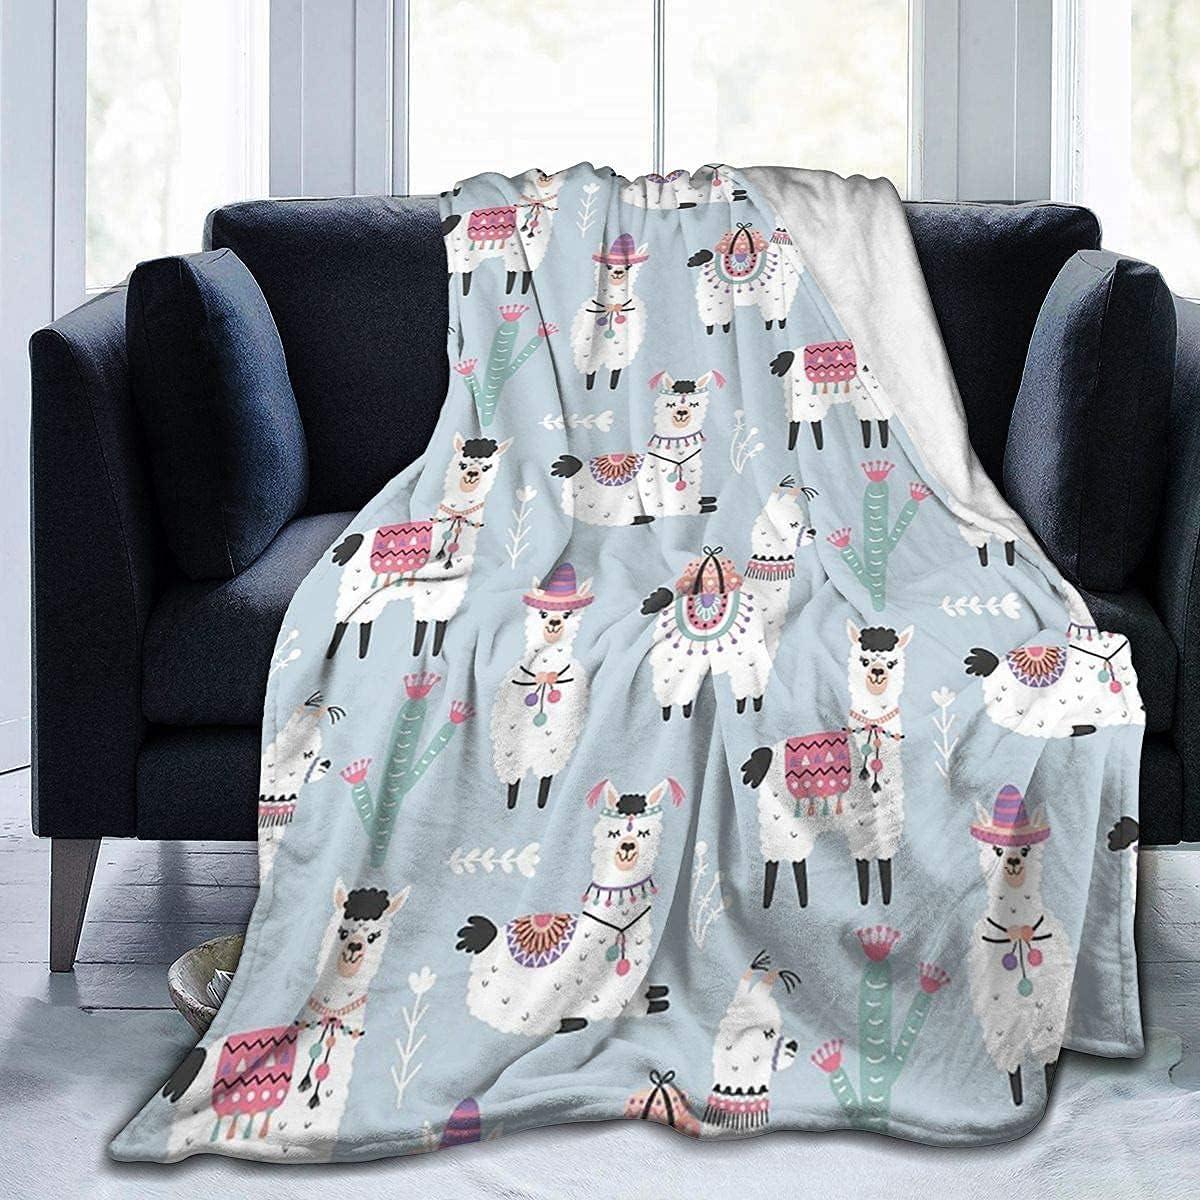 Cartoon Llama Bombing free shipping Alpaca Phoenix Mall Soft Throw Blanket Fla Lightweight 40